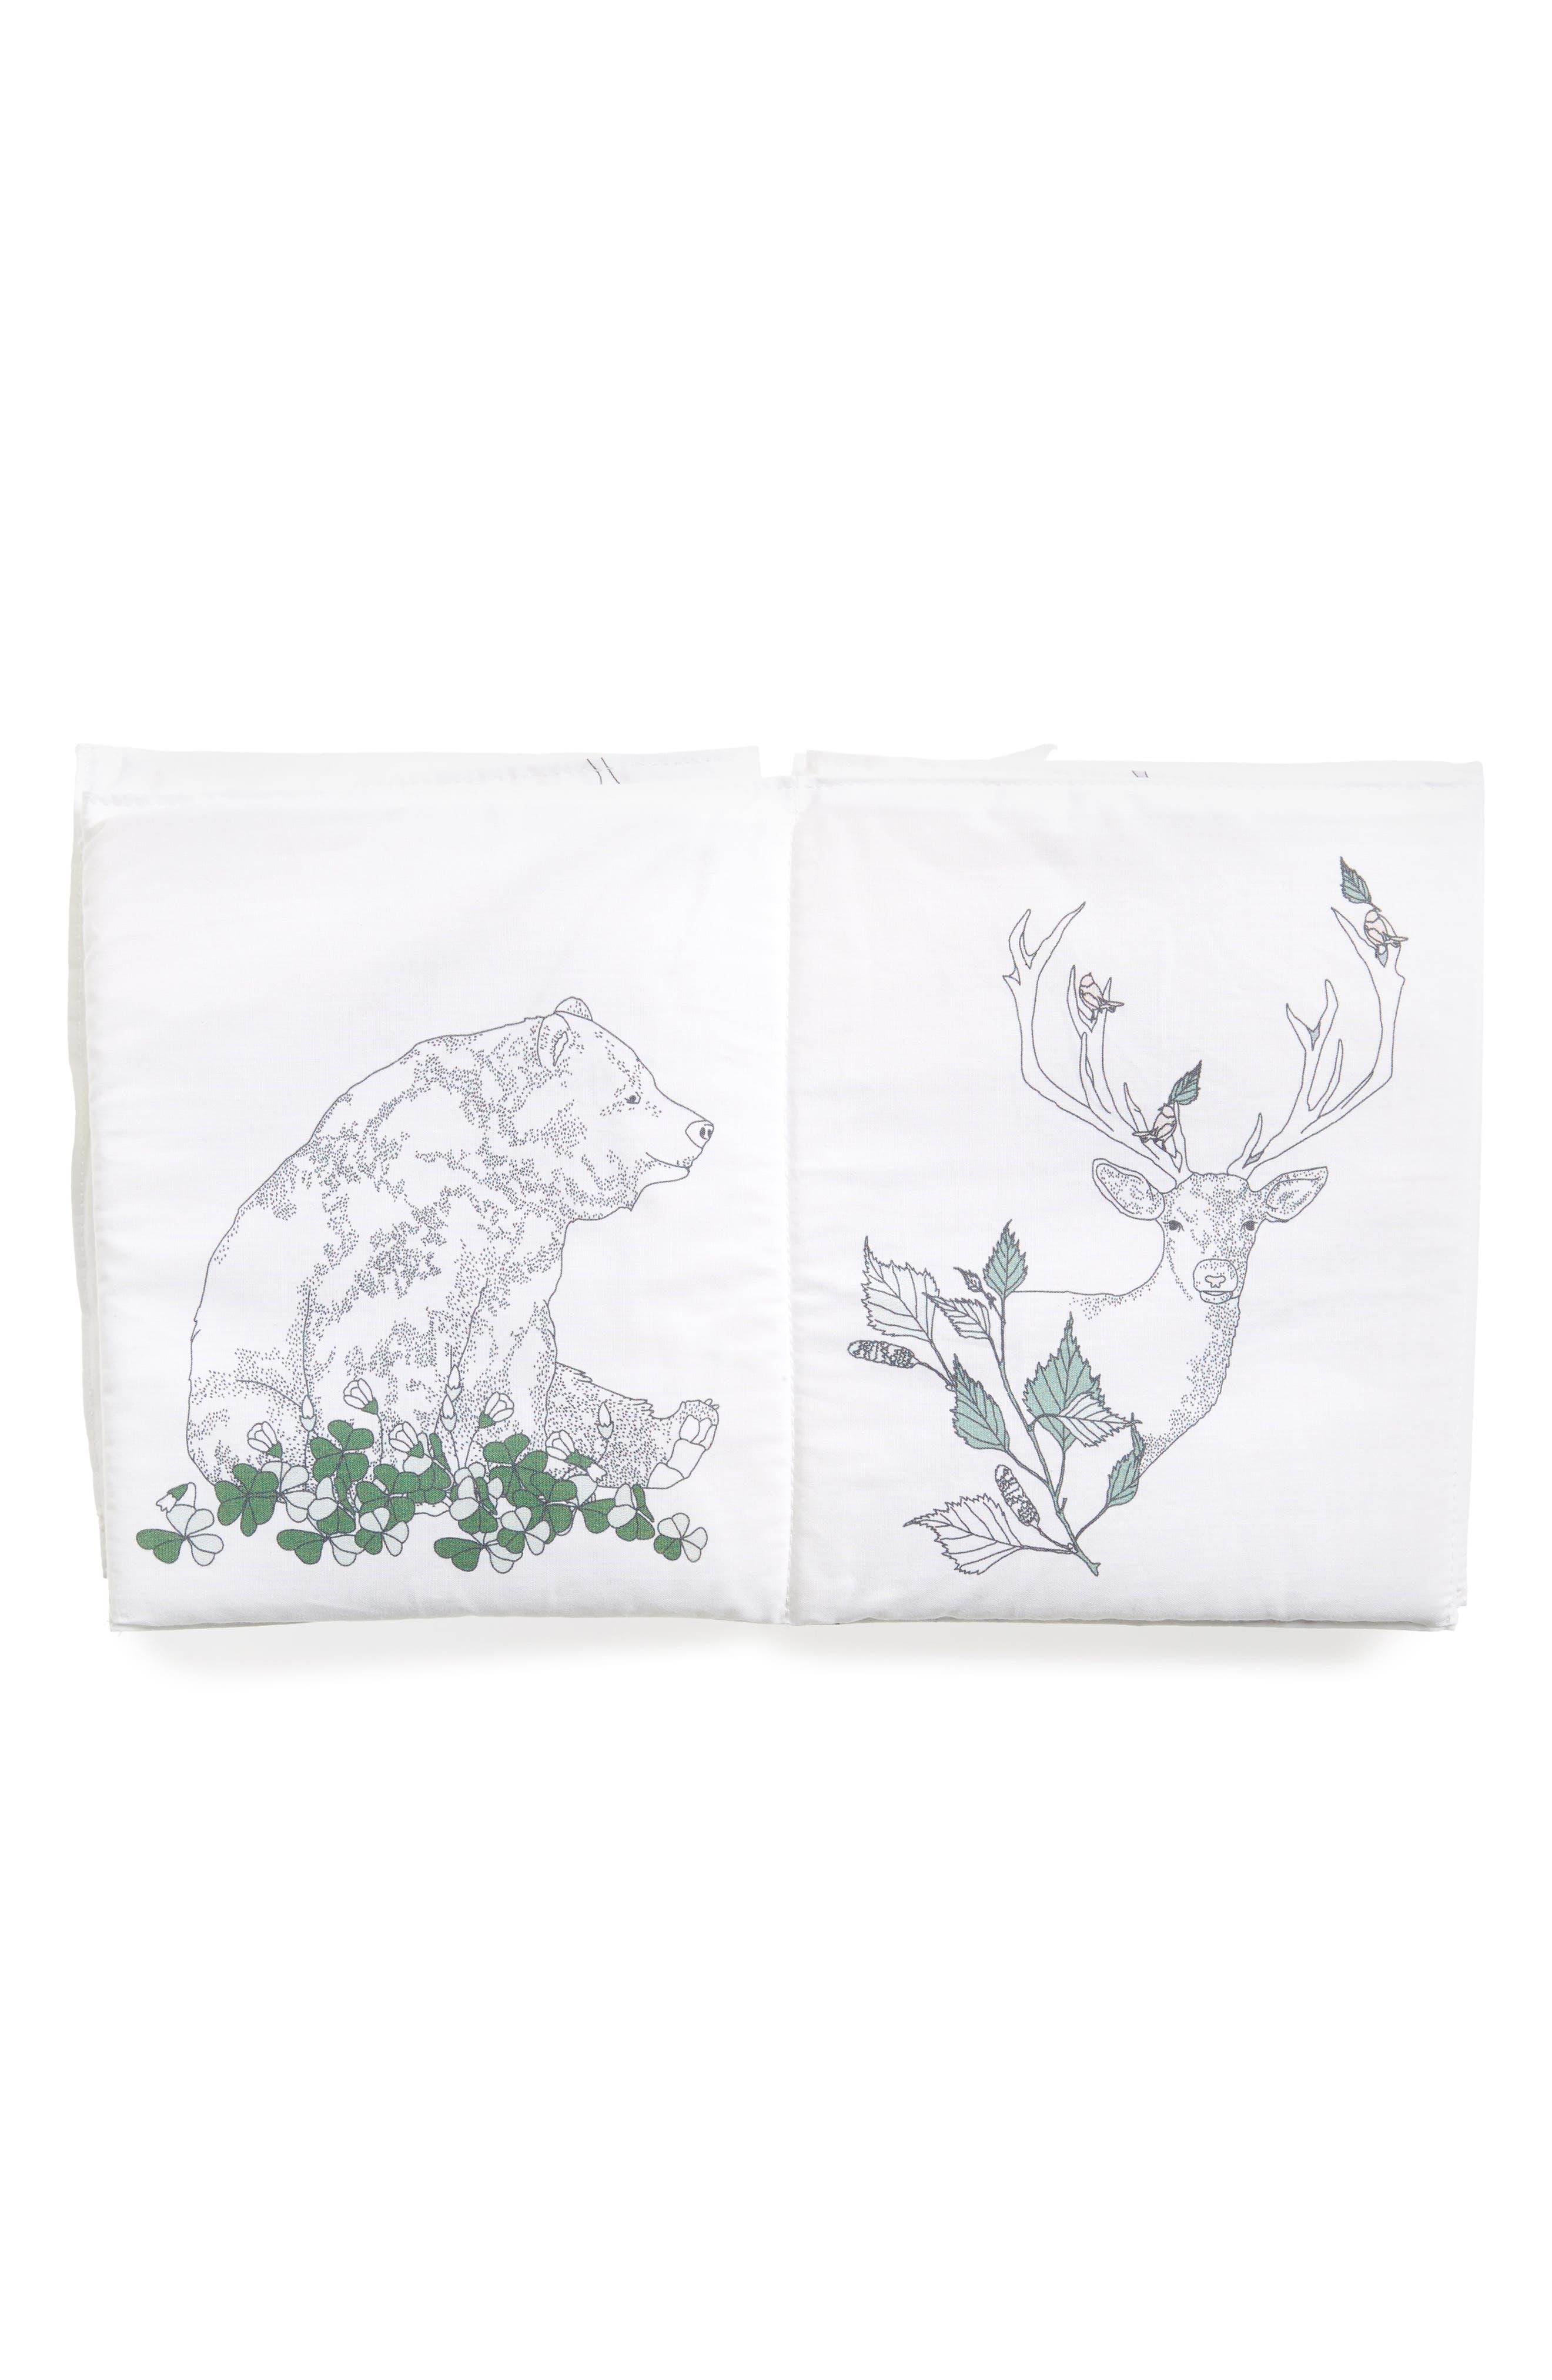 Flora & Fauna Fabric Book,                             Alternate thumbnail 2, color,                             100